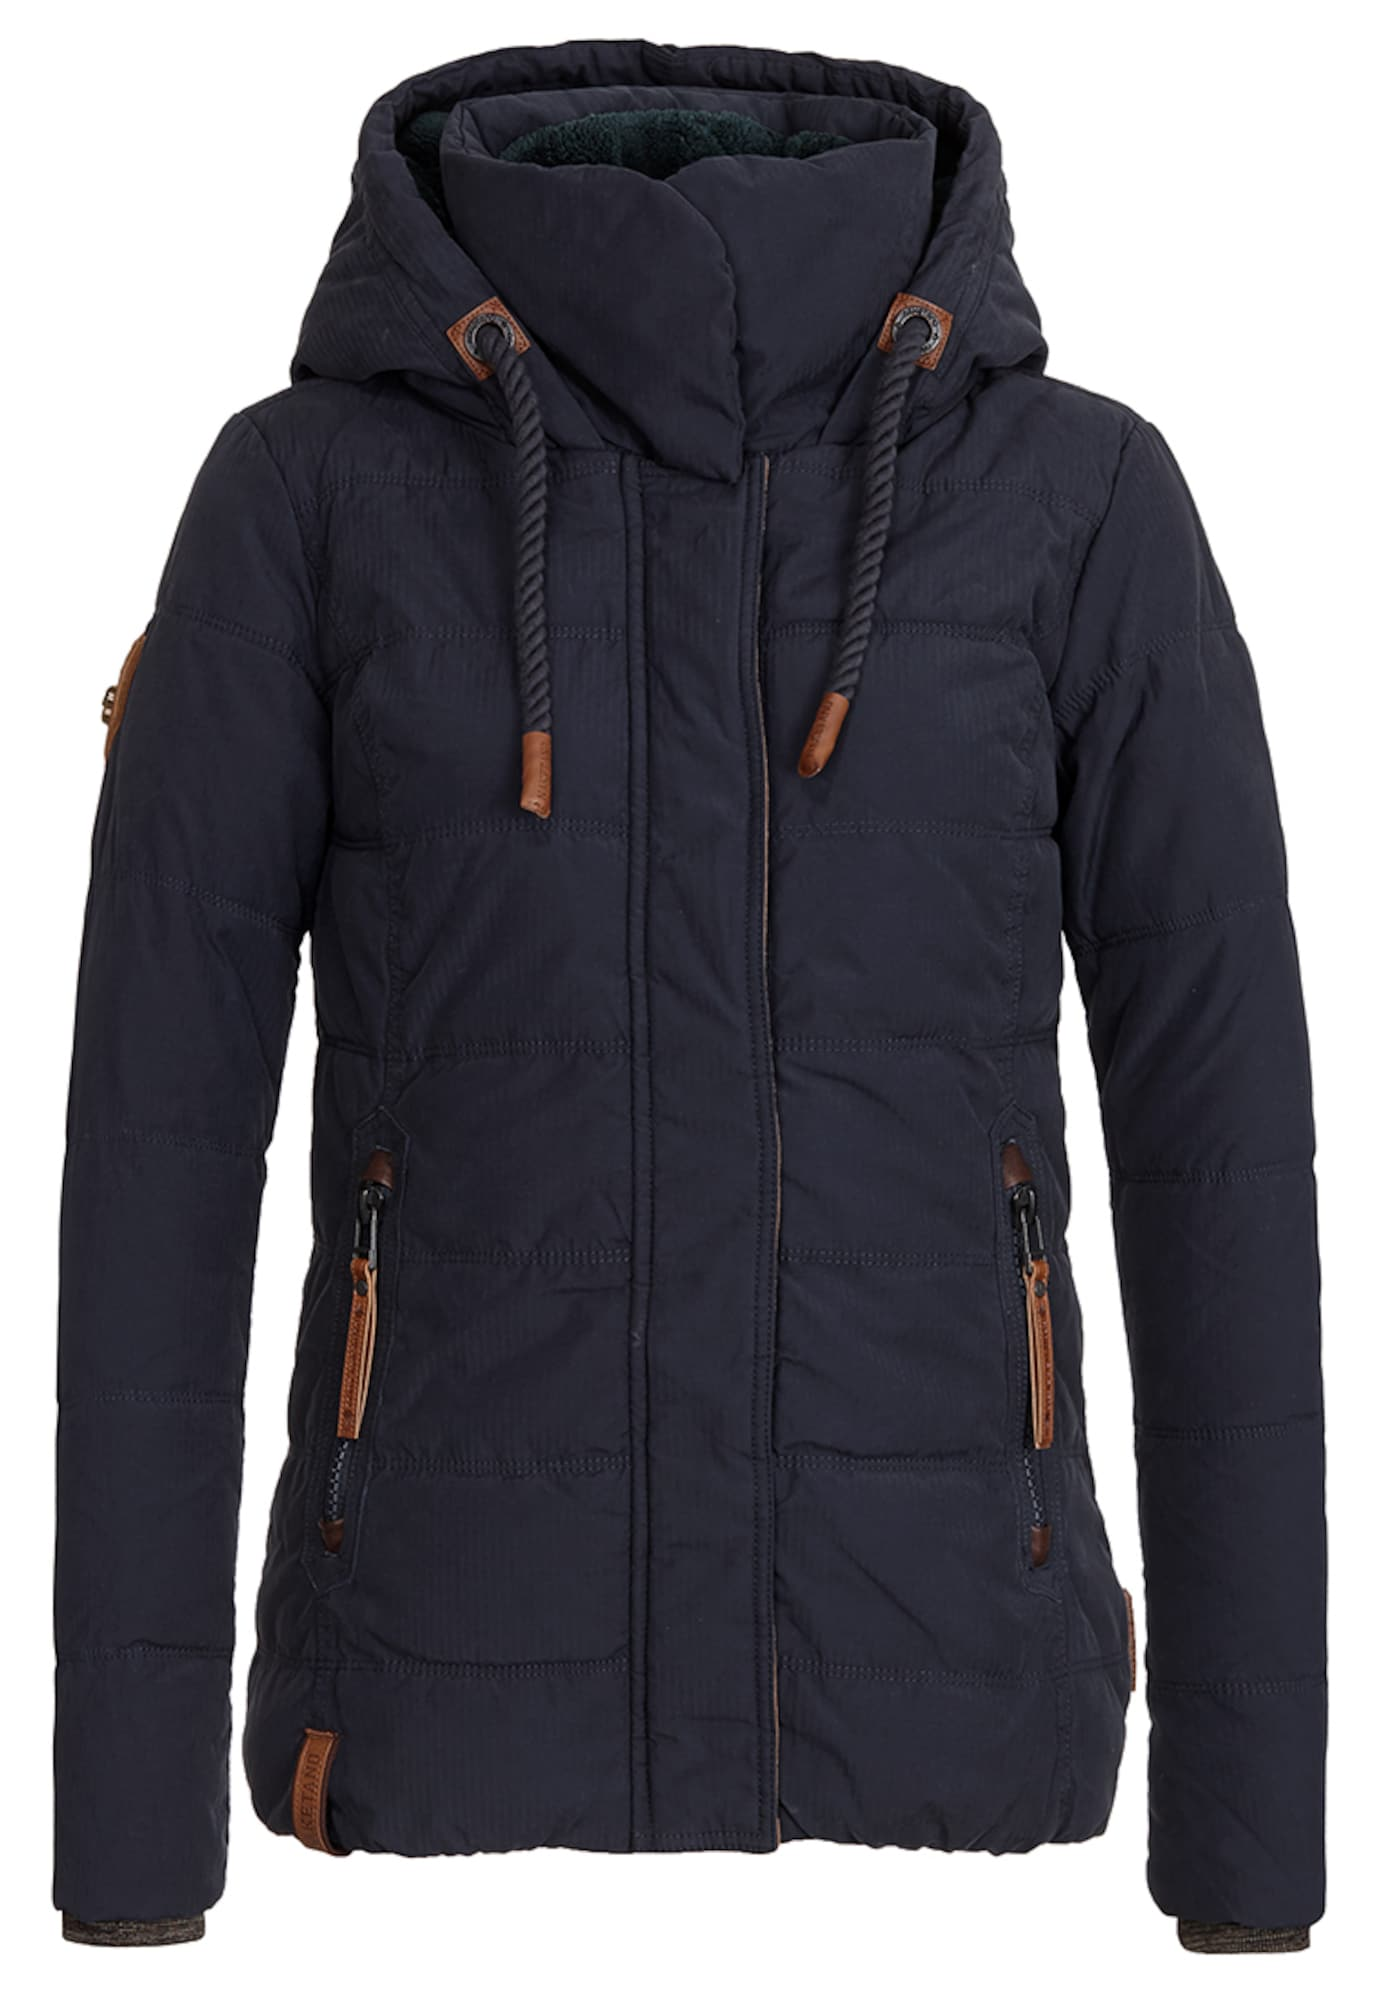 Zimní bunda Pronto Salvatore tmavě modrá Naketano